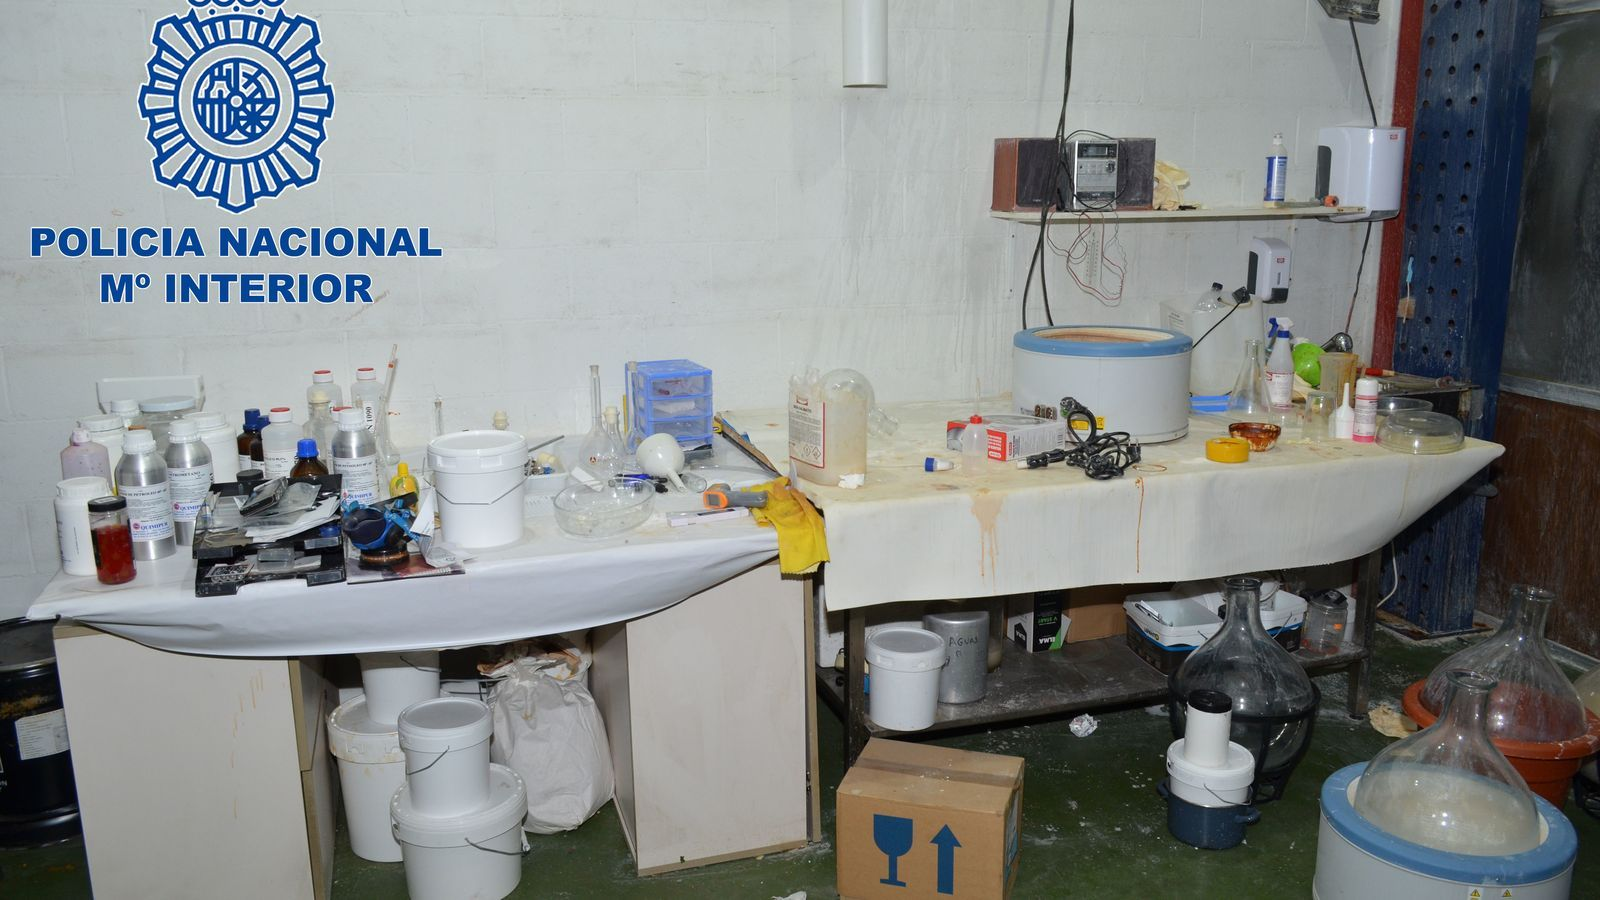 Desmantellats dos laboratoris d''speed' a Lleida i Osca